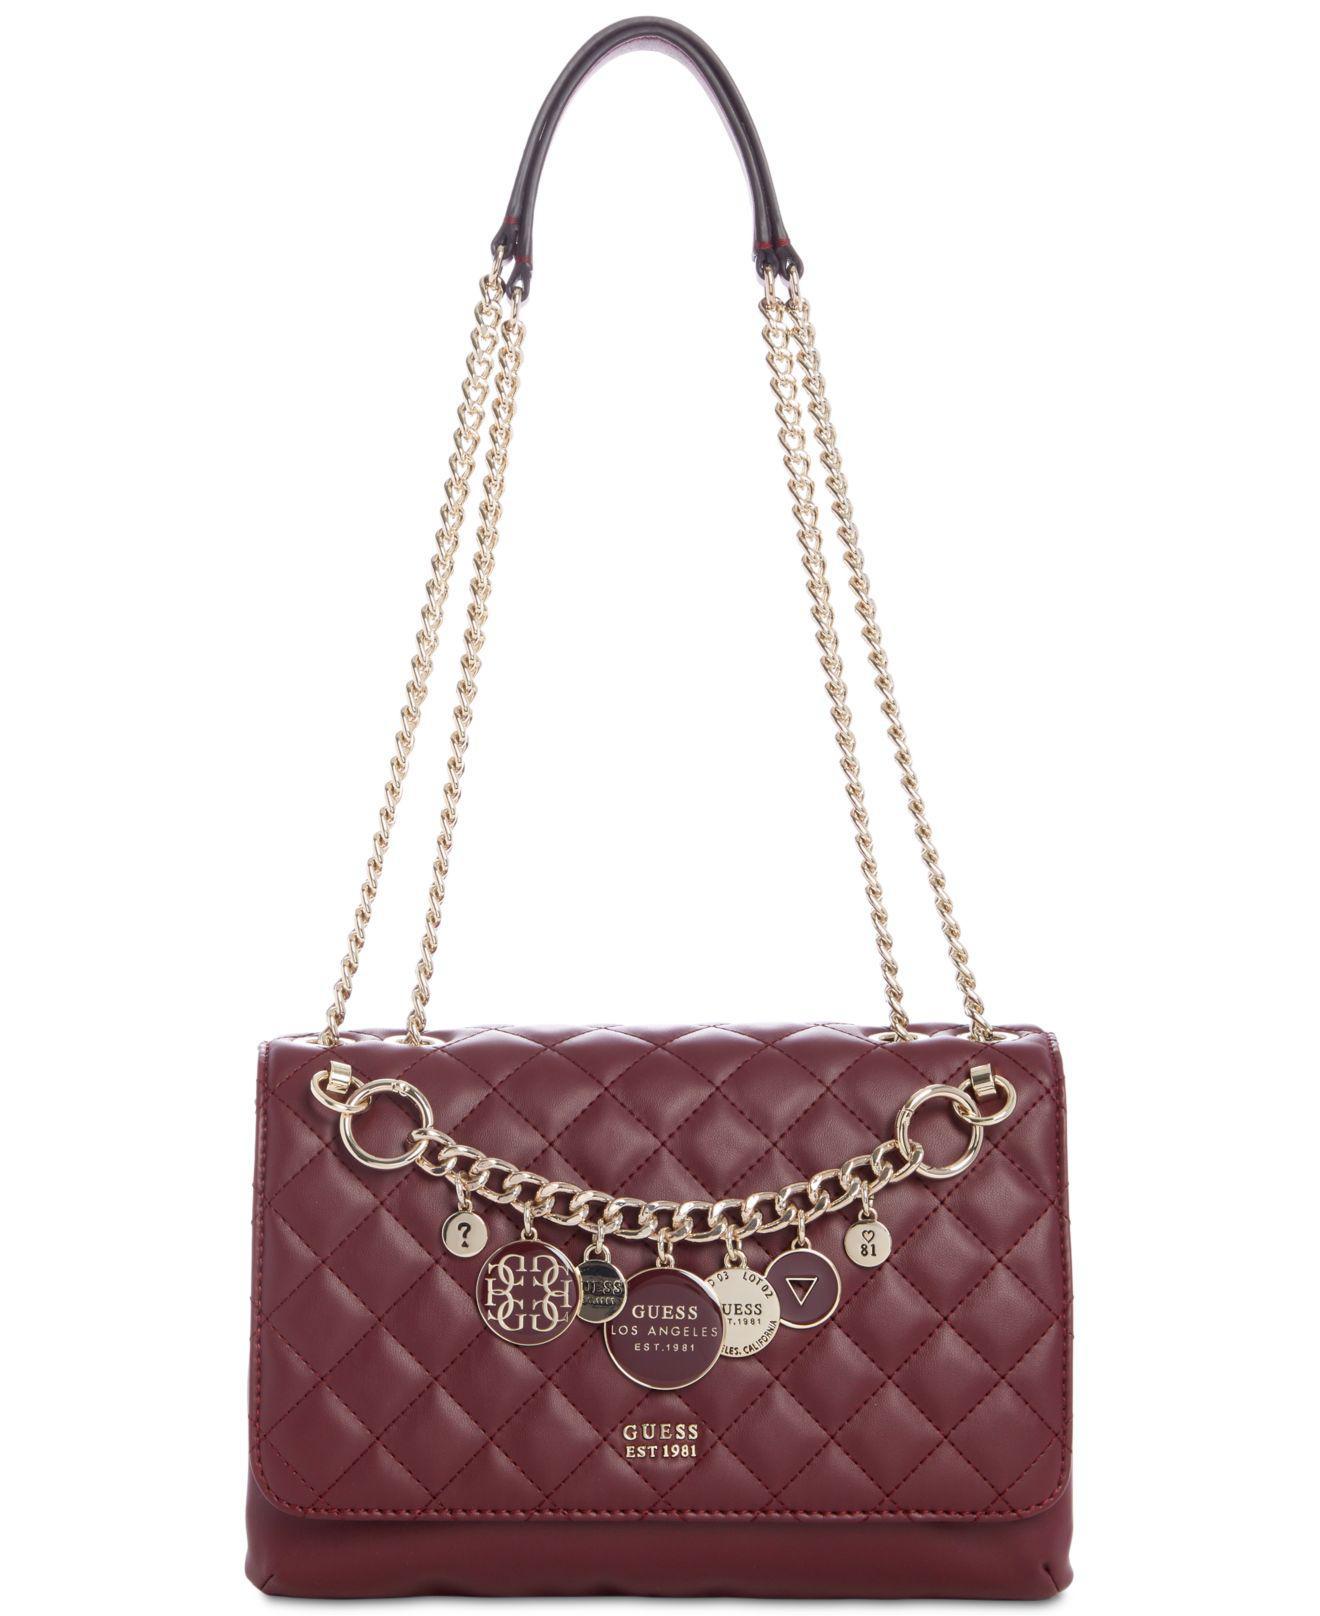 Lyst - Guess Victoria Chain Shoulder Bag 2cd4f238011ed